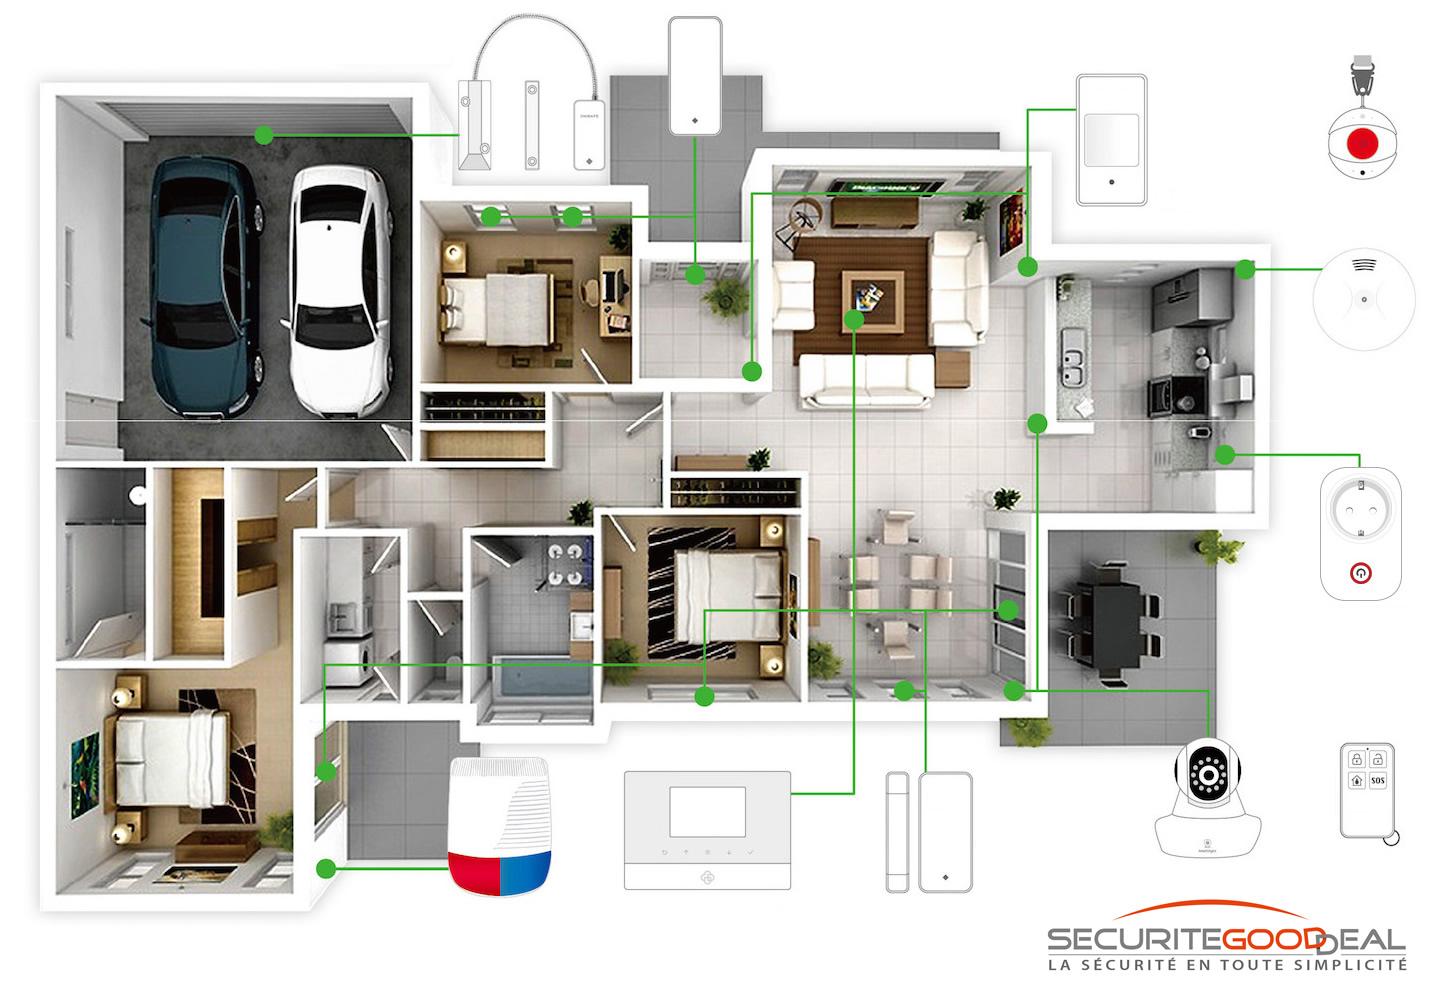 Comment installer alarme maison sans fil ventana blog for Alarmes de maison